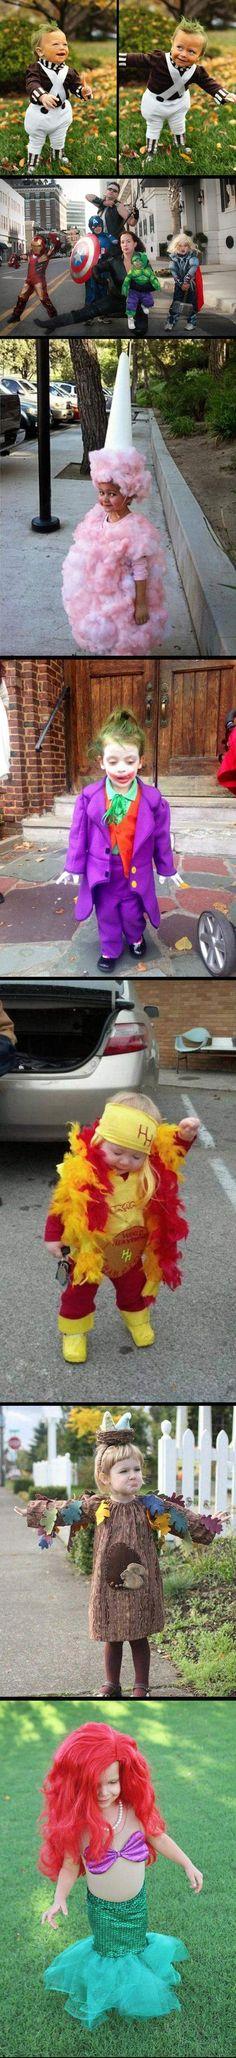 funny kids Halloween costume avengers